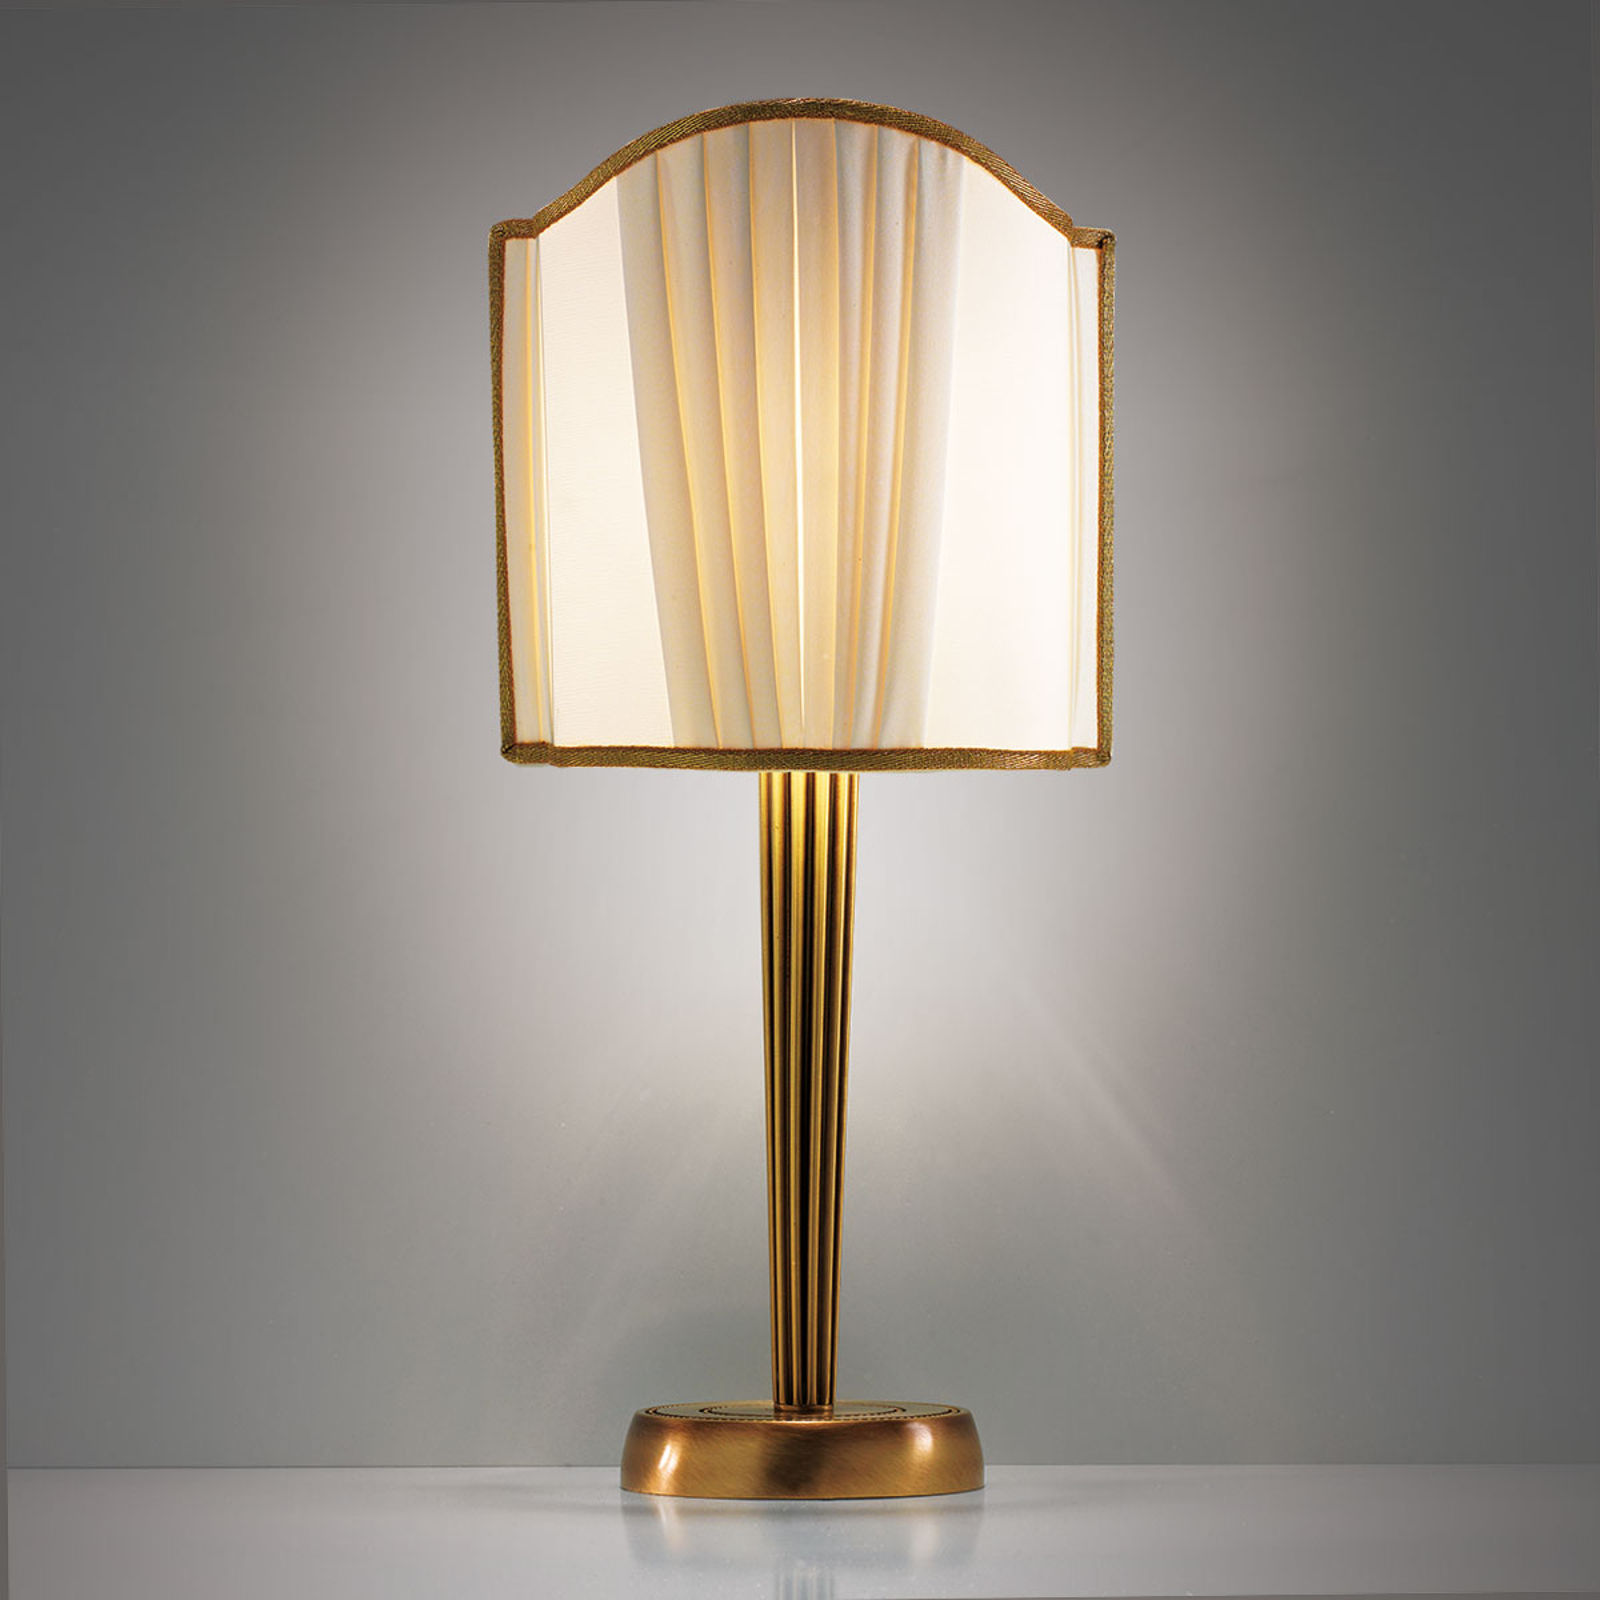 Beautiful Belle Epoque table lamp_2008188_1